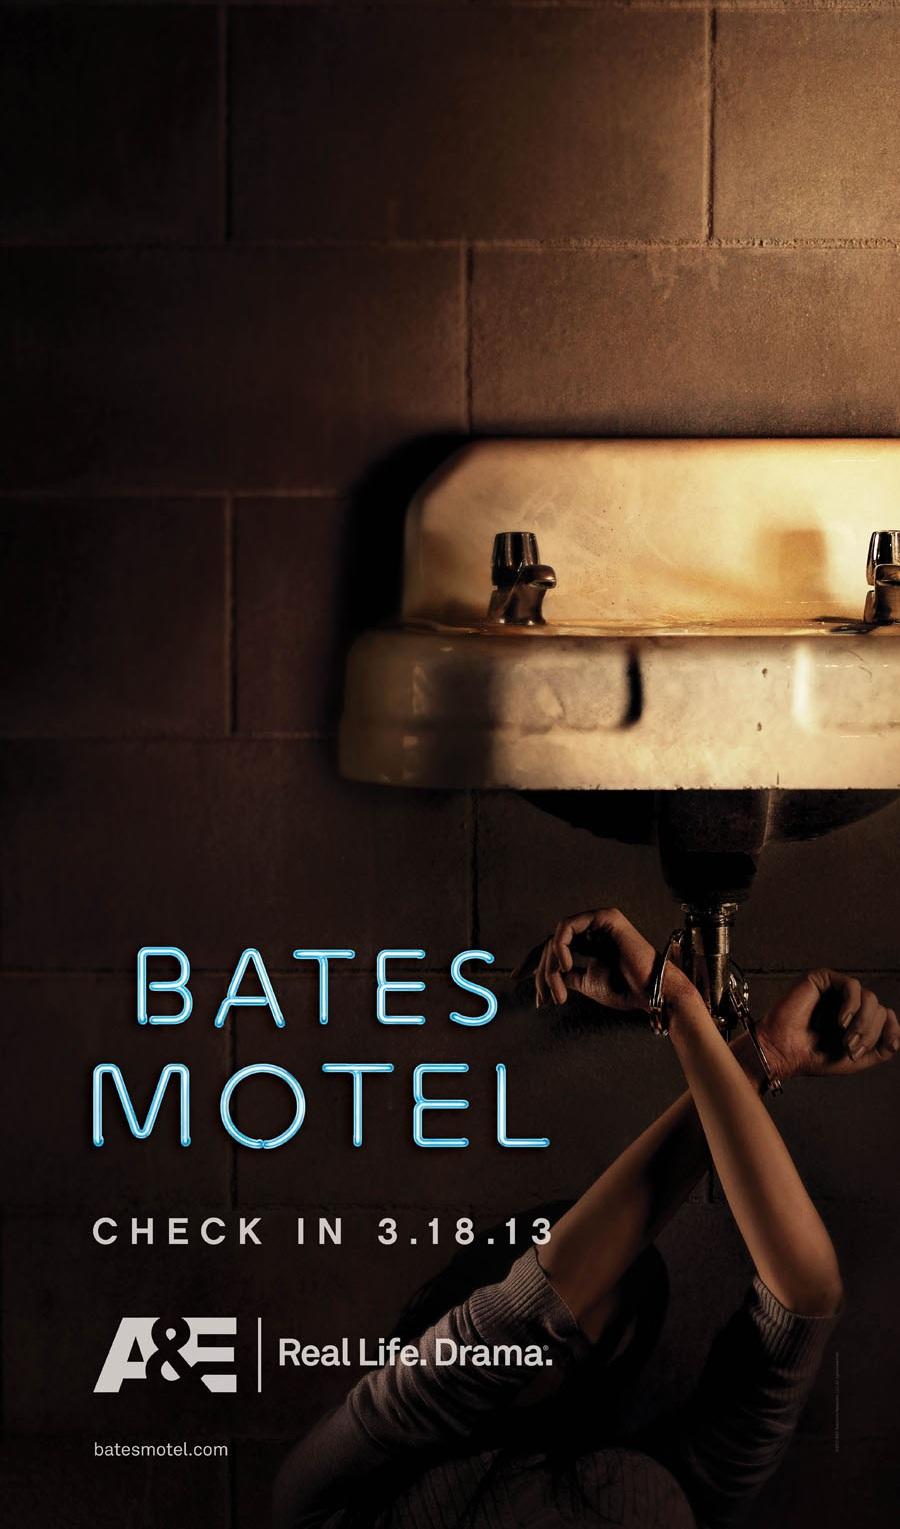 Мотель Бейтса - Bates Motel